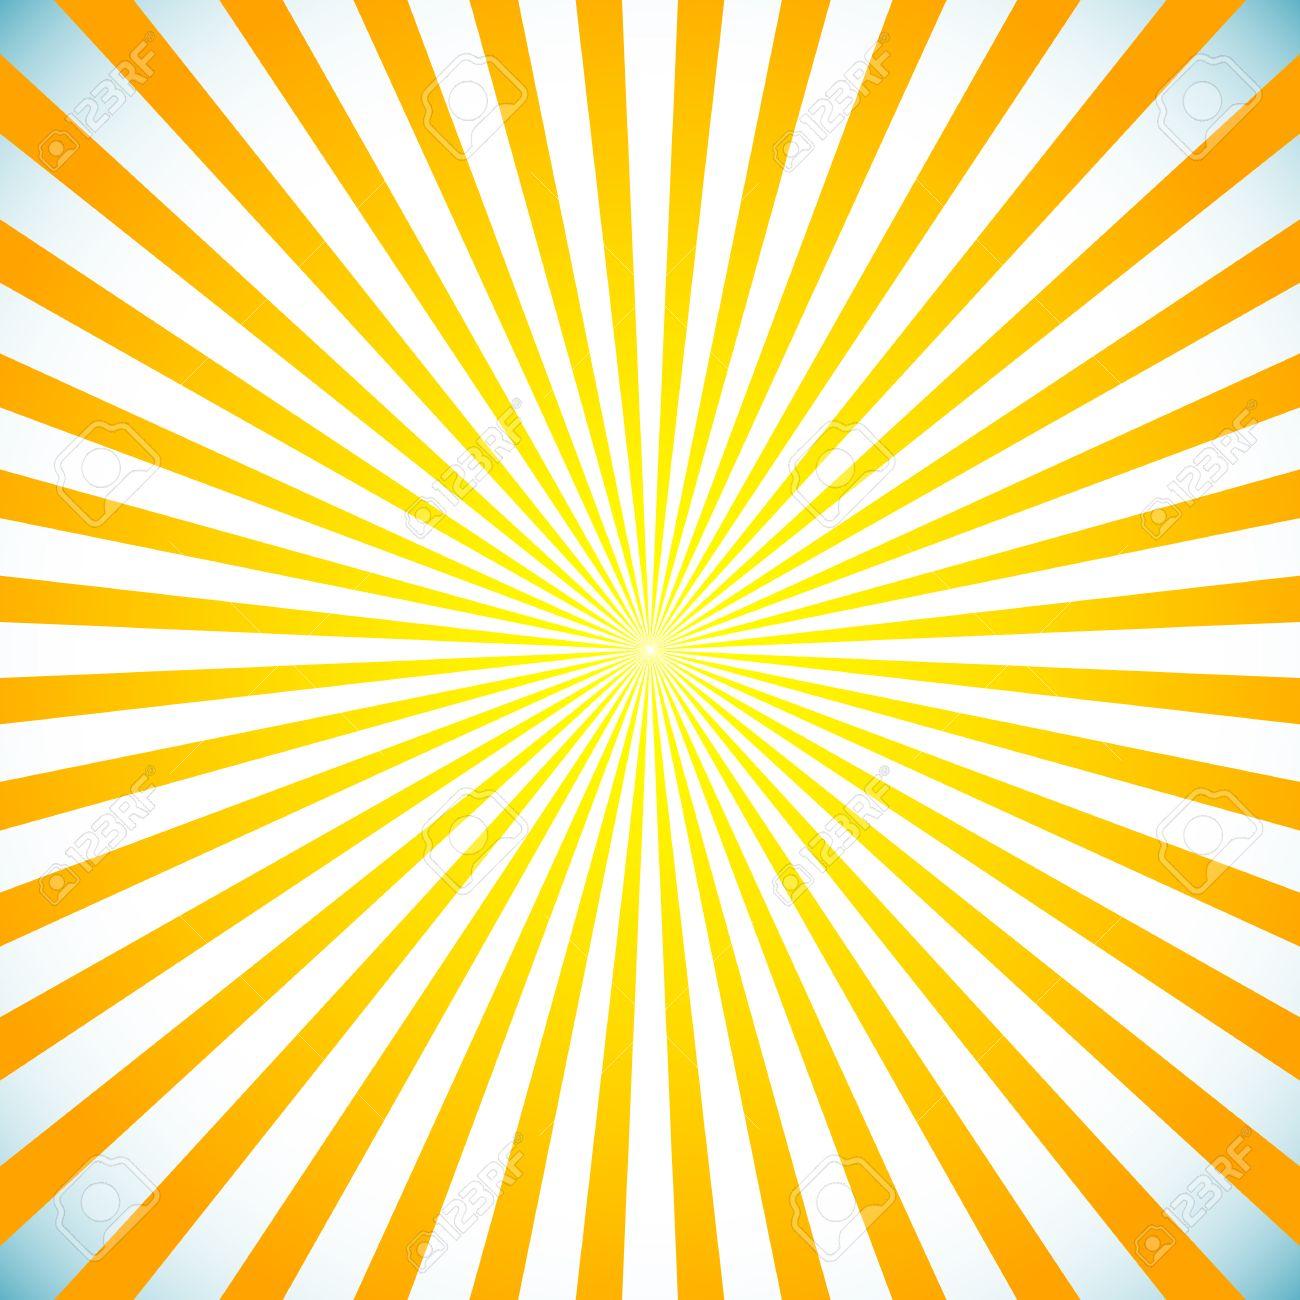 Background image center - Vector Illustration Of A Bright Sunbrust Starburst Background Sun Light Spreading From Center